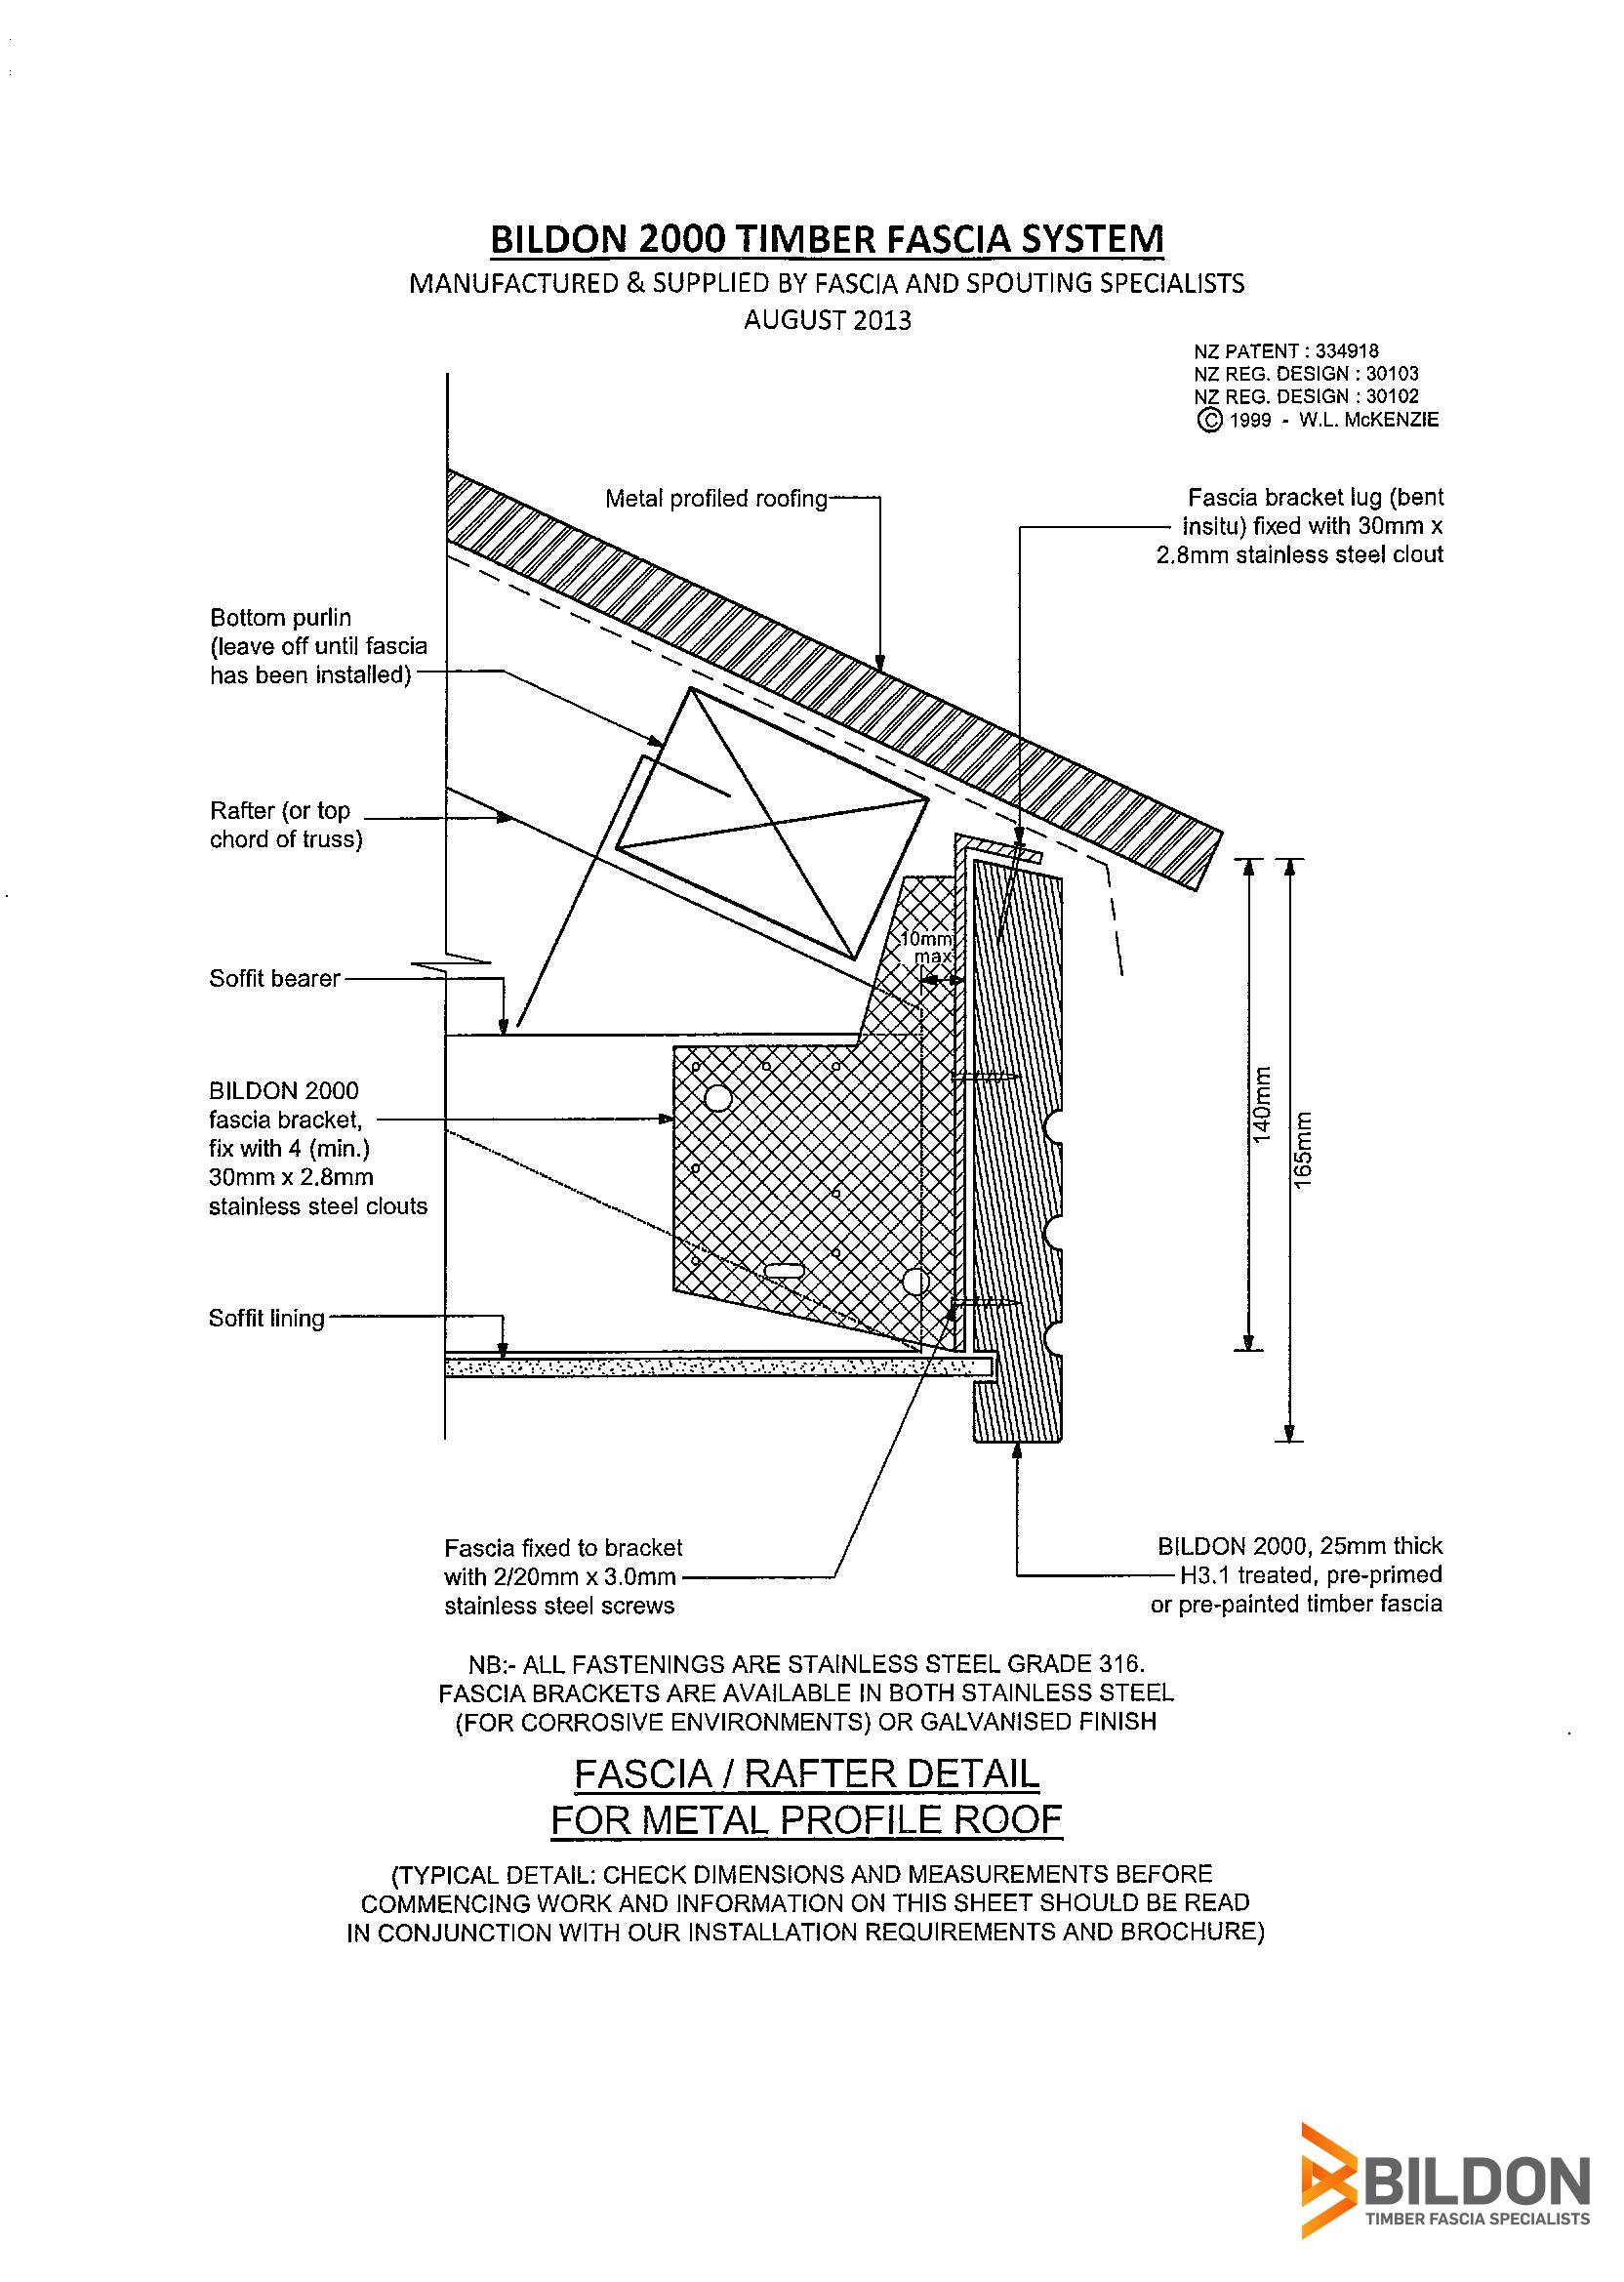 Fascia:Rafter Detail for metal Profile Roof.jpg